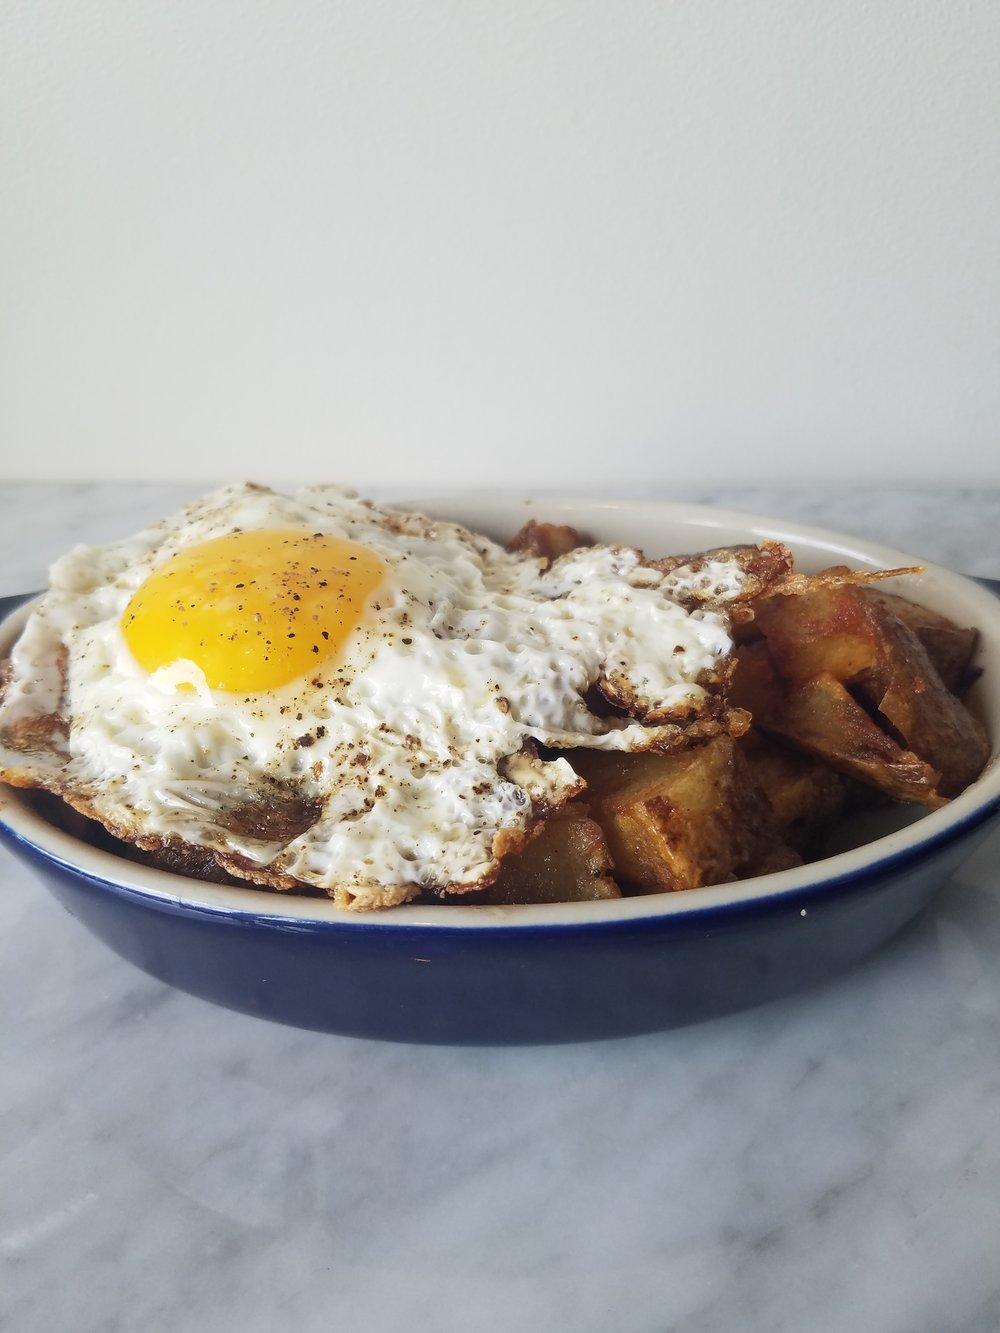 WEDNESDAYSPork Hash  - With Fried Egg